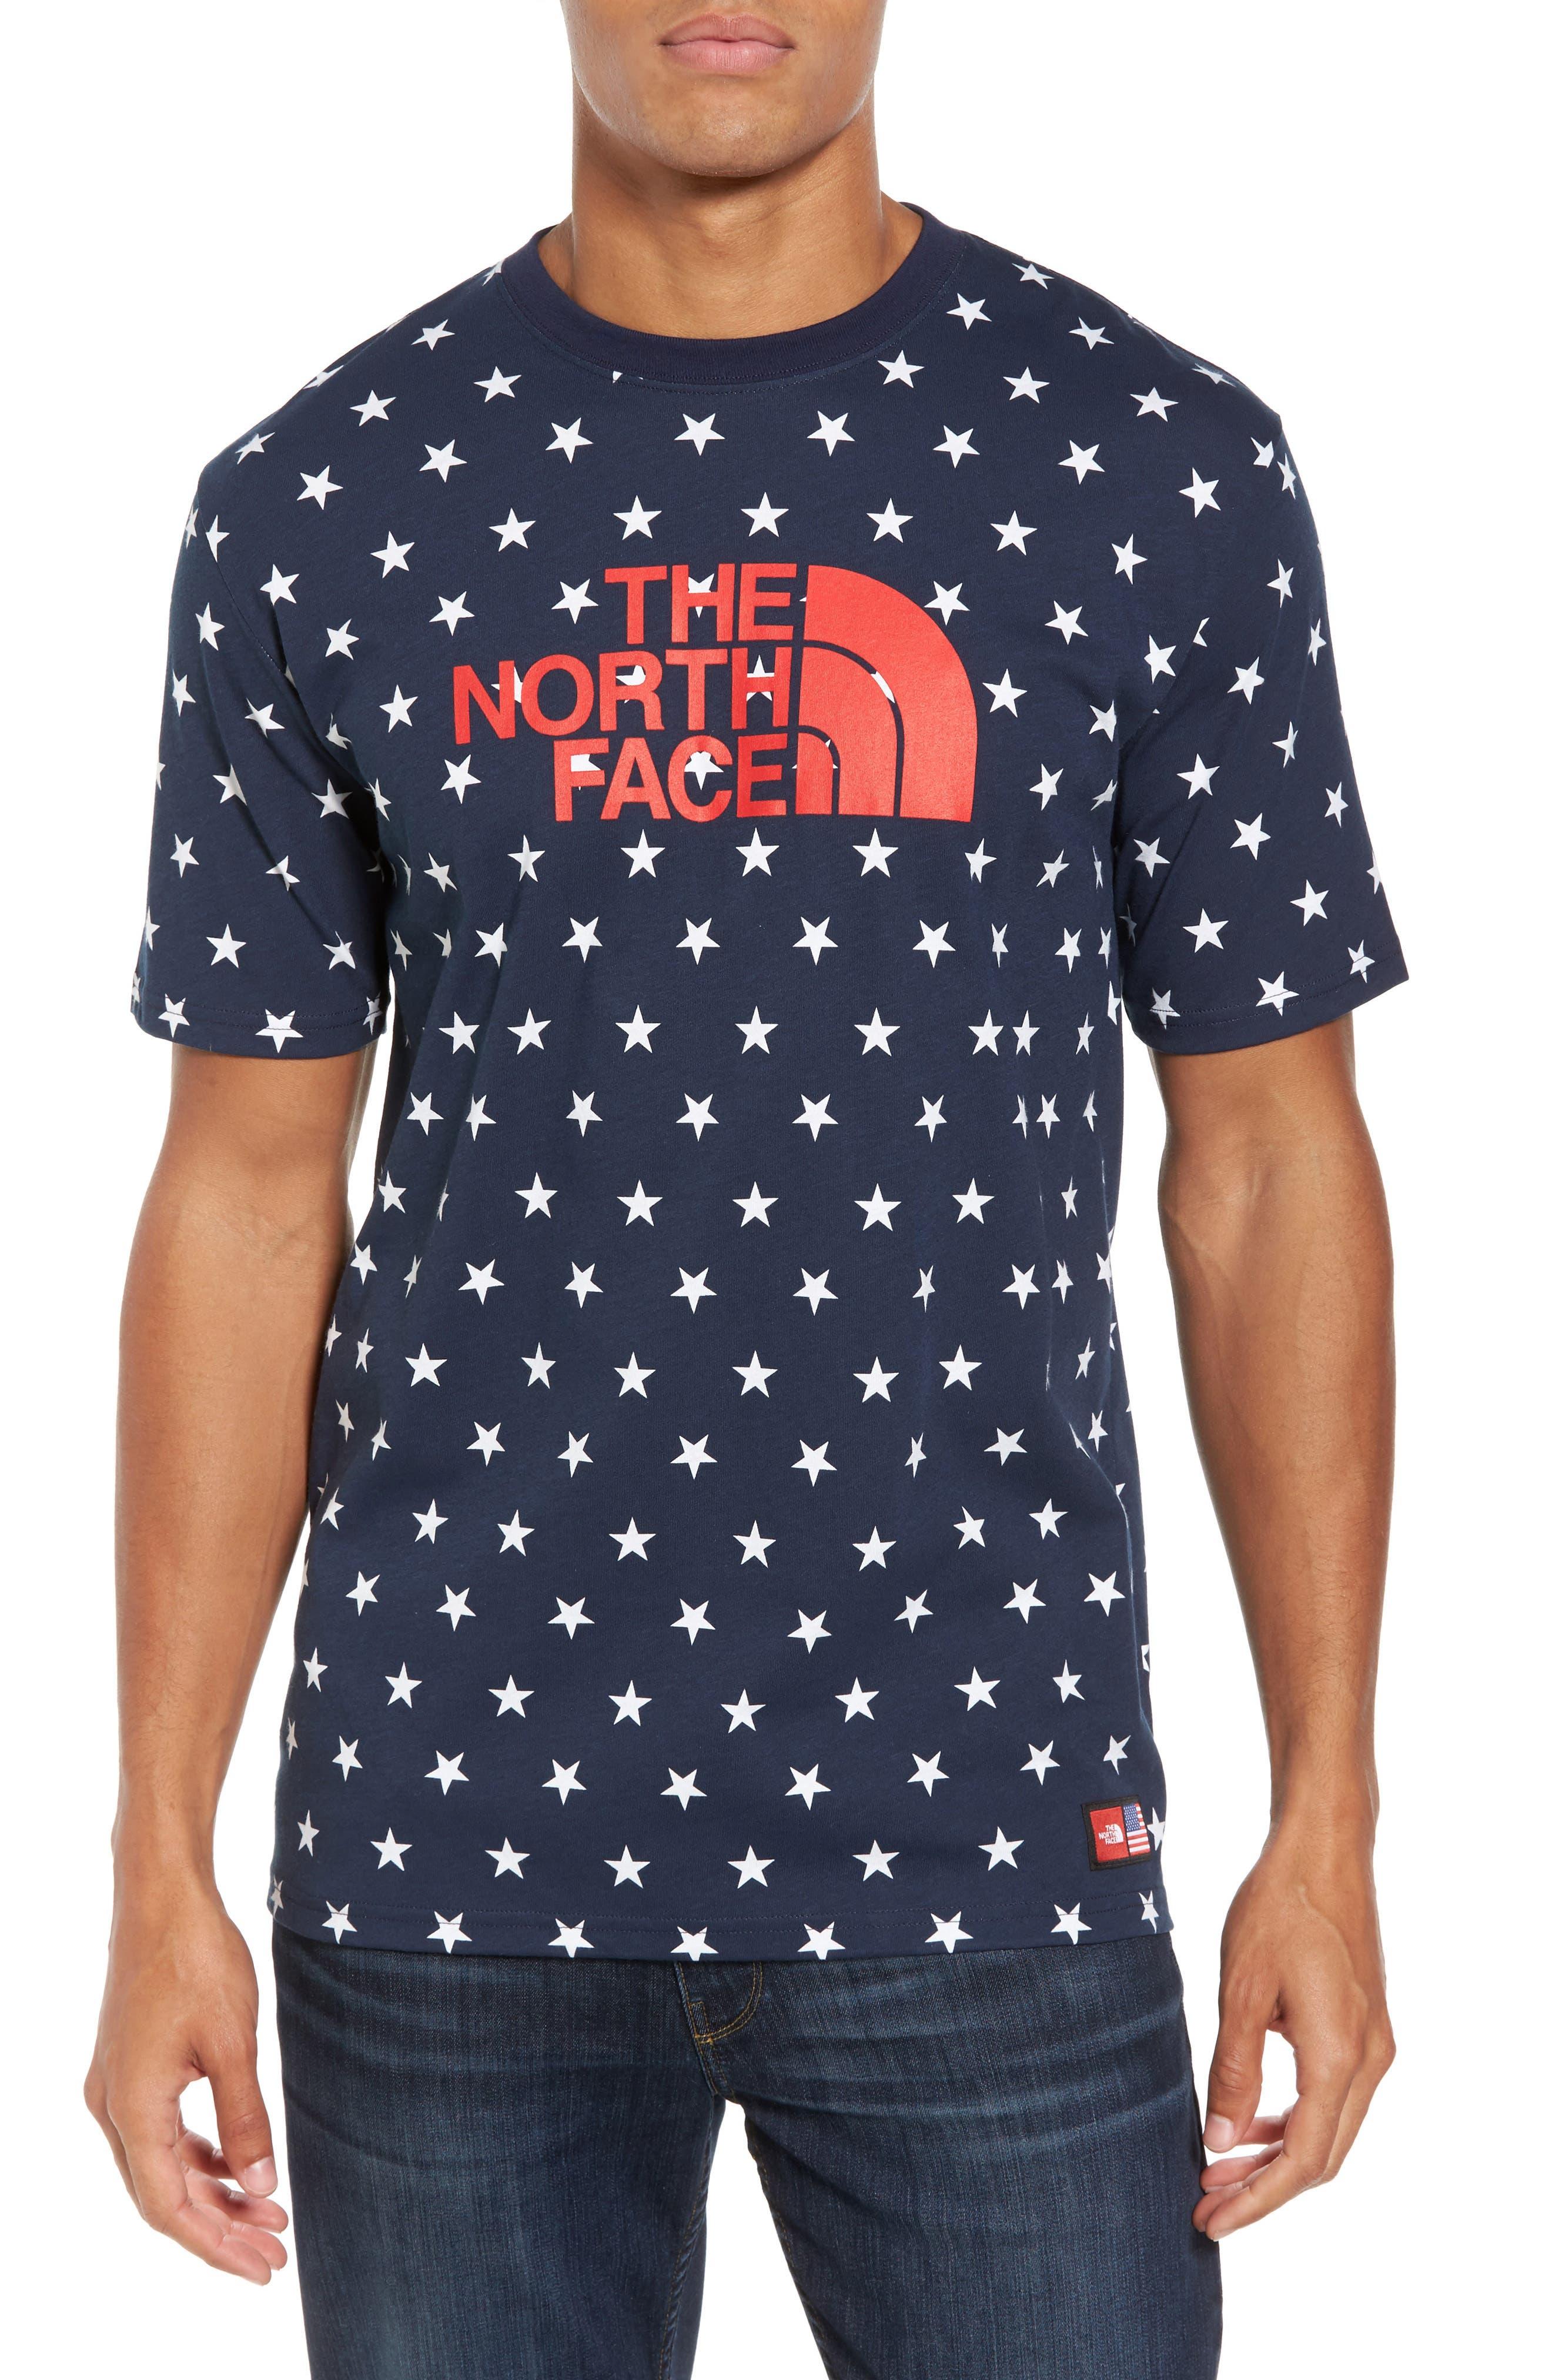 International Collection Star Print T-Shirt,                             Main thumbnail 1, color,                             Cosmic Blue Star Print